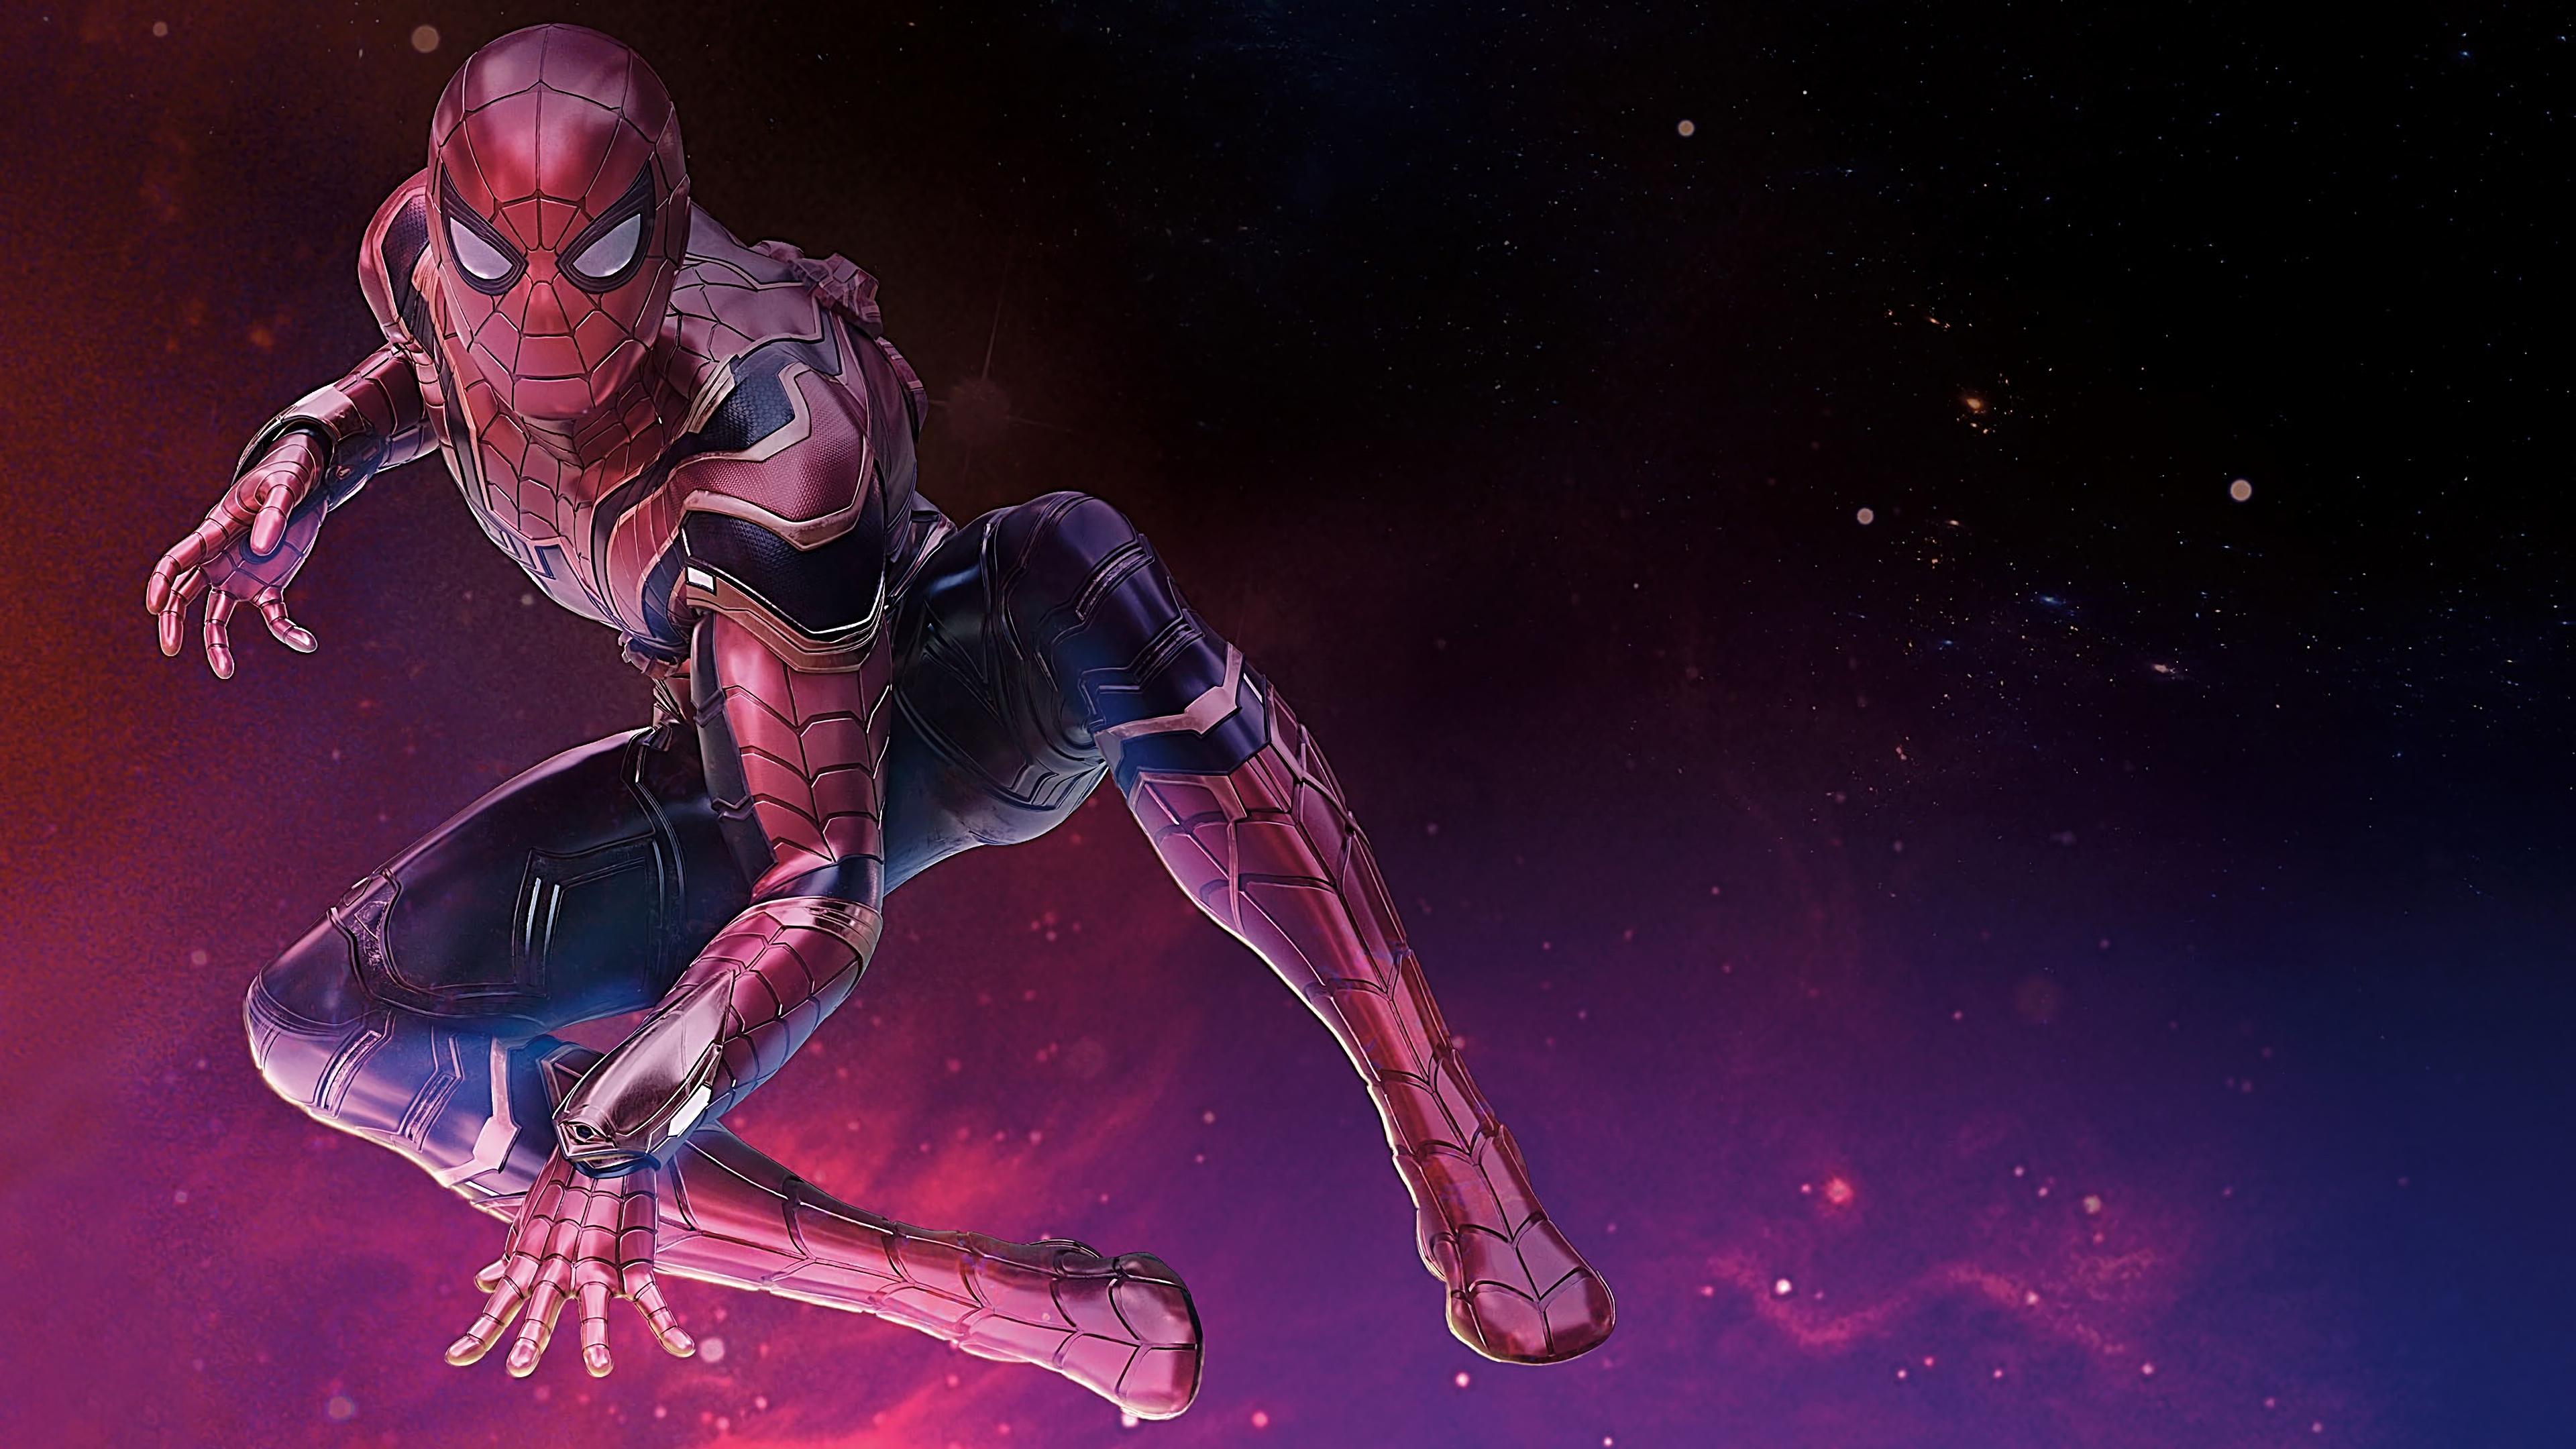 Avengers infinity war iron spider man 4k ultra hd - Iron man spiderman wallpaper ...